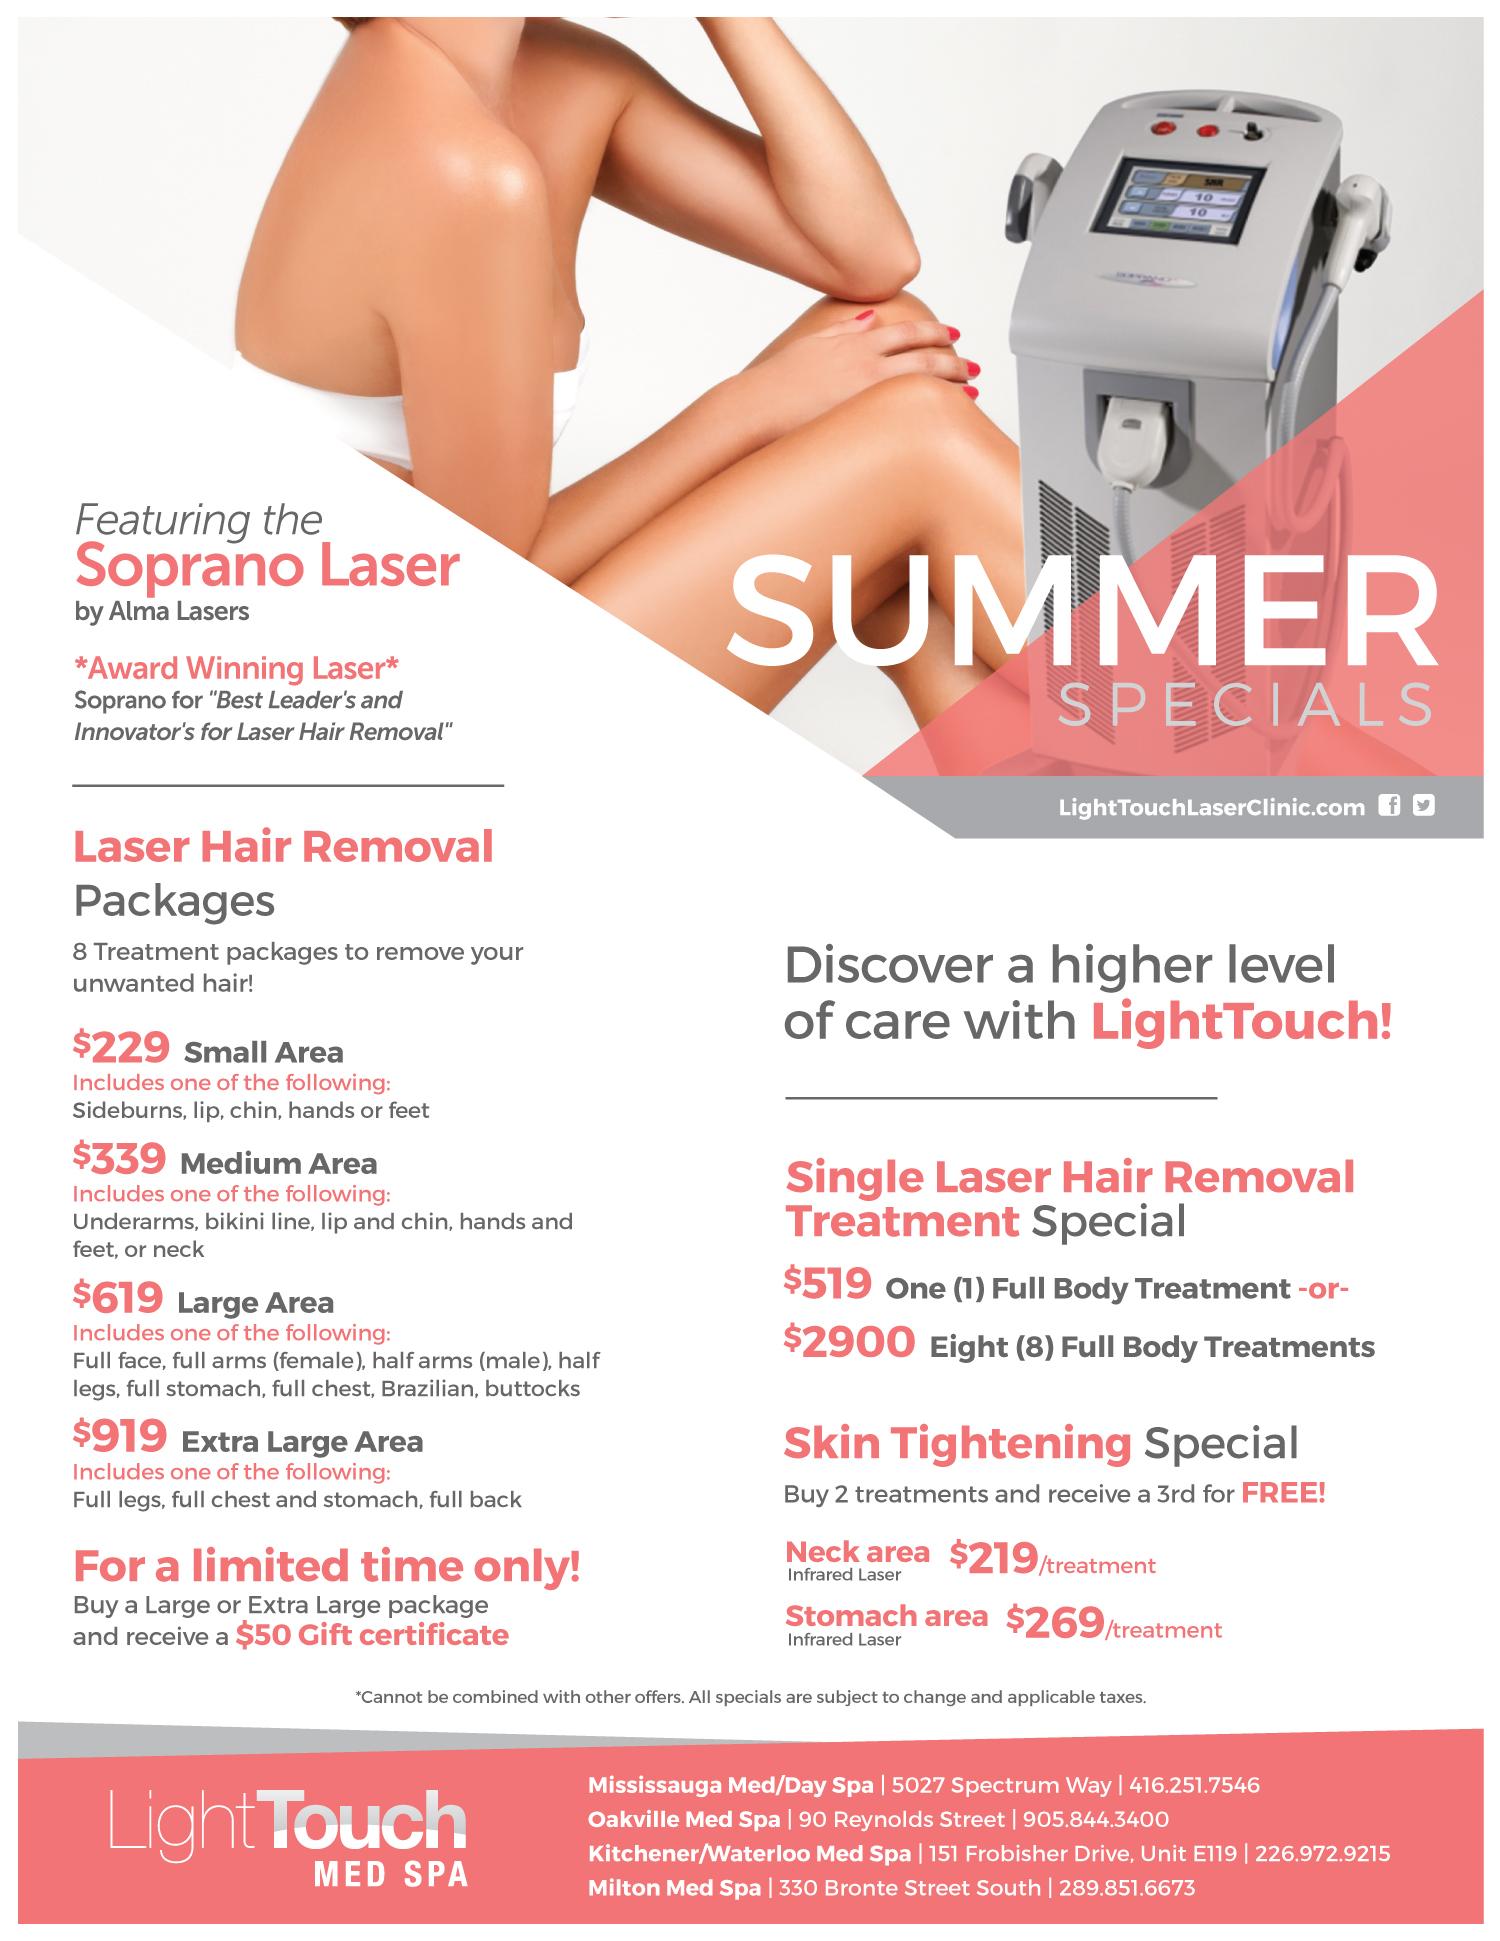 Med Spa Specials Lighttouch Laser Clinic